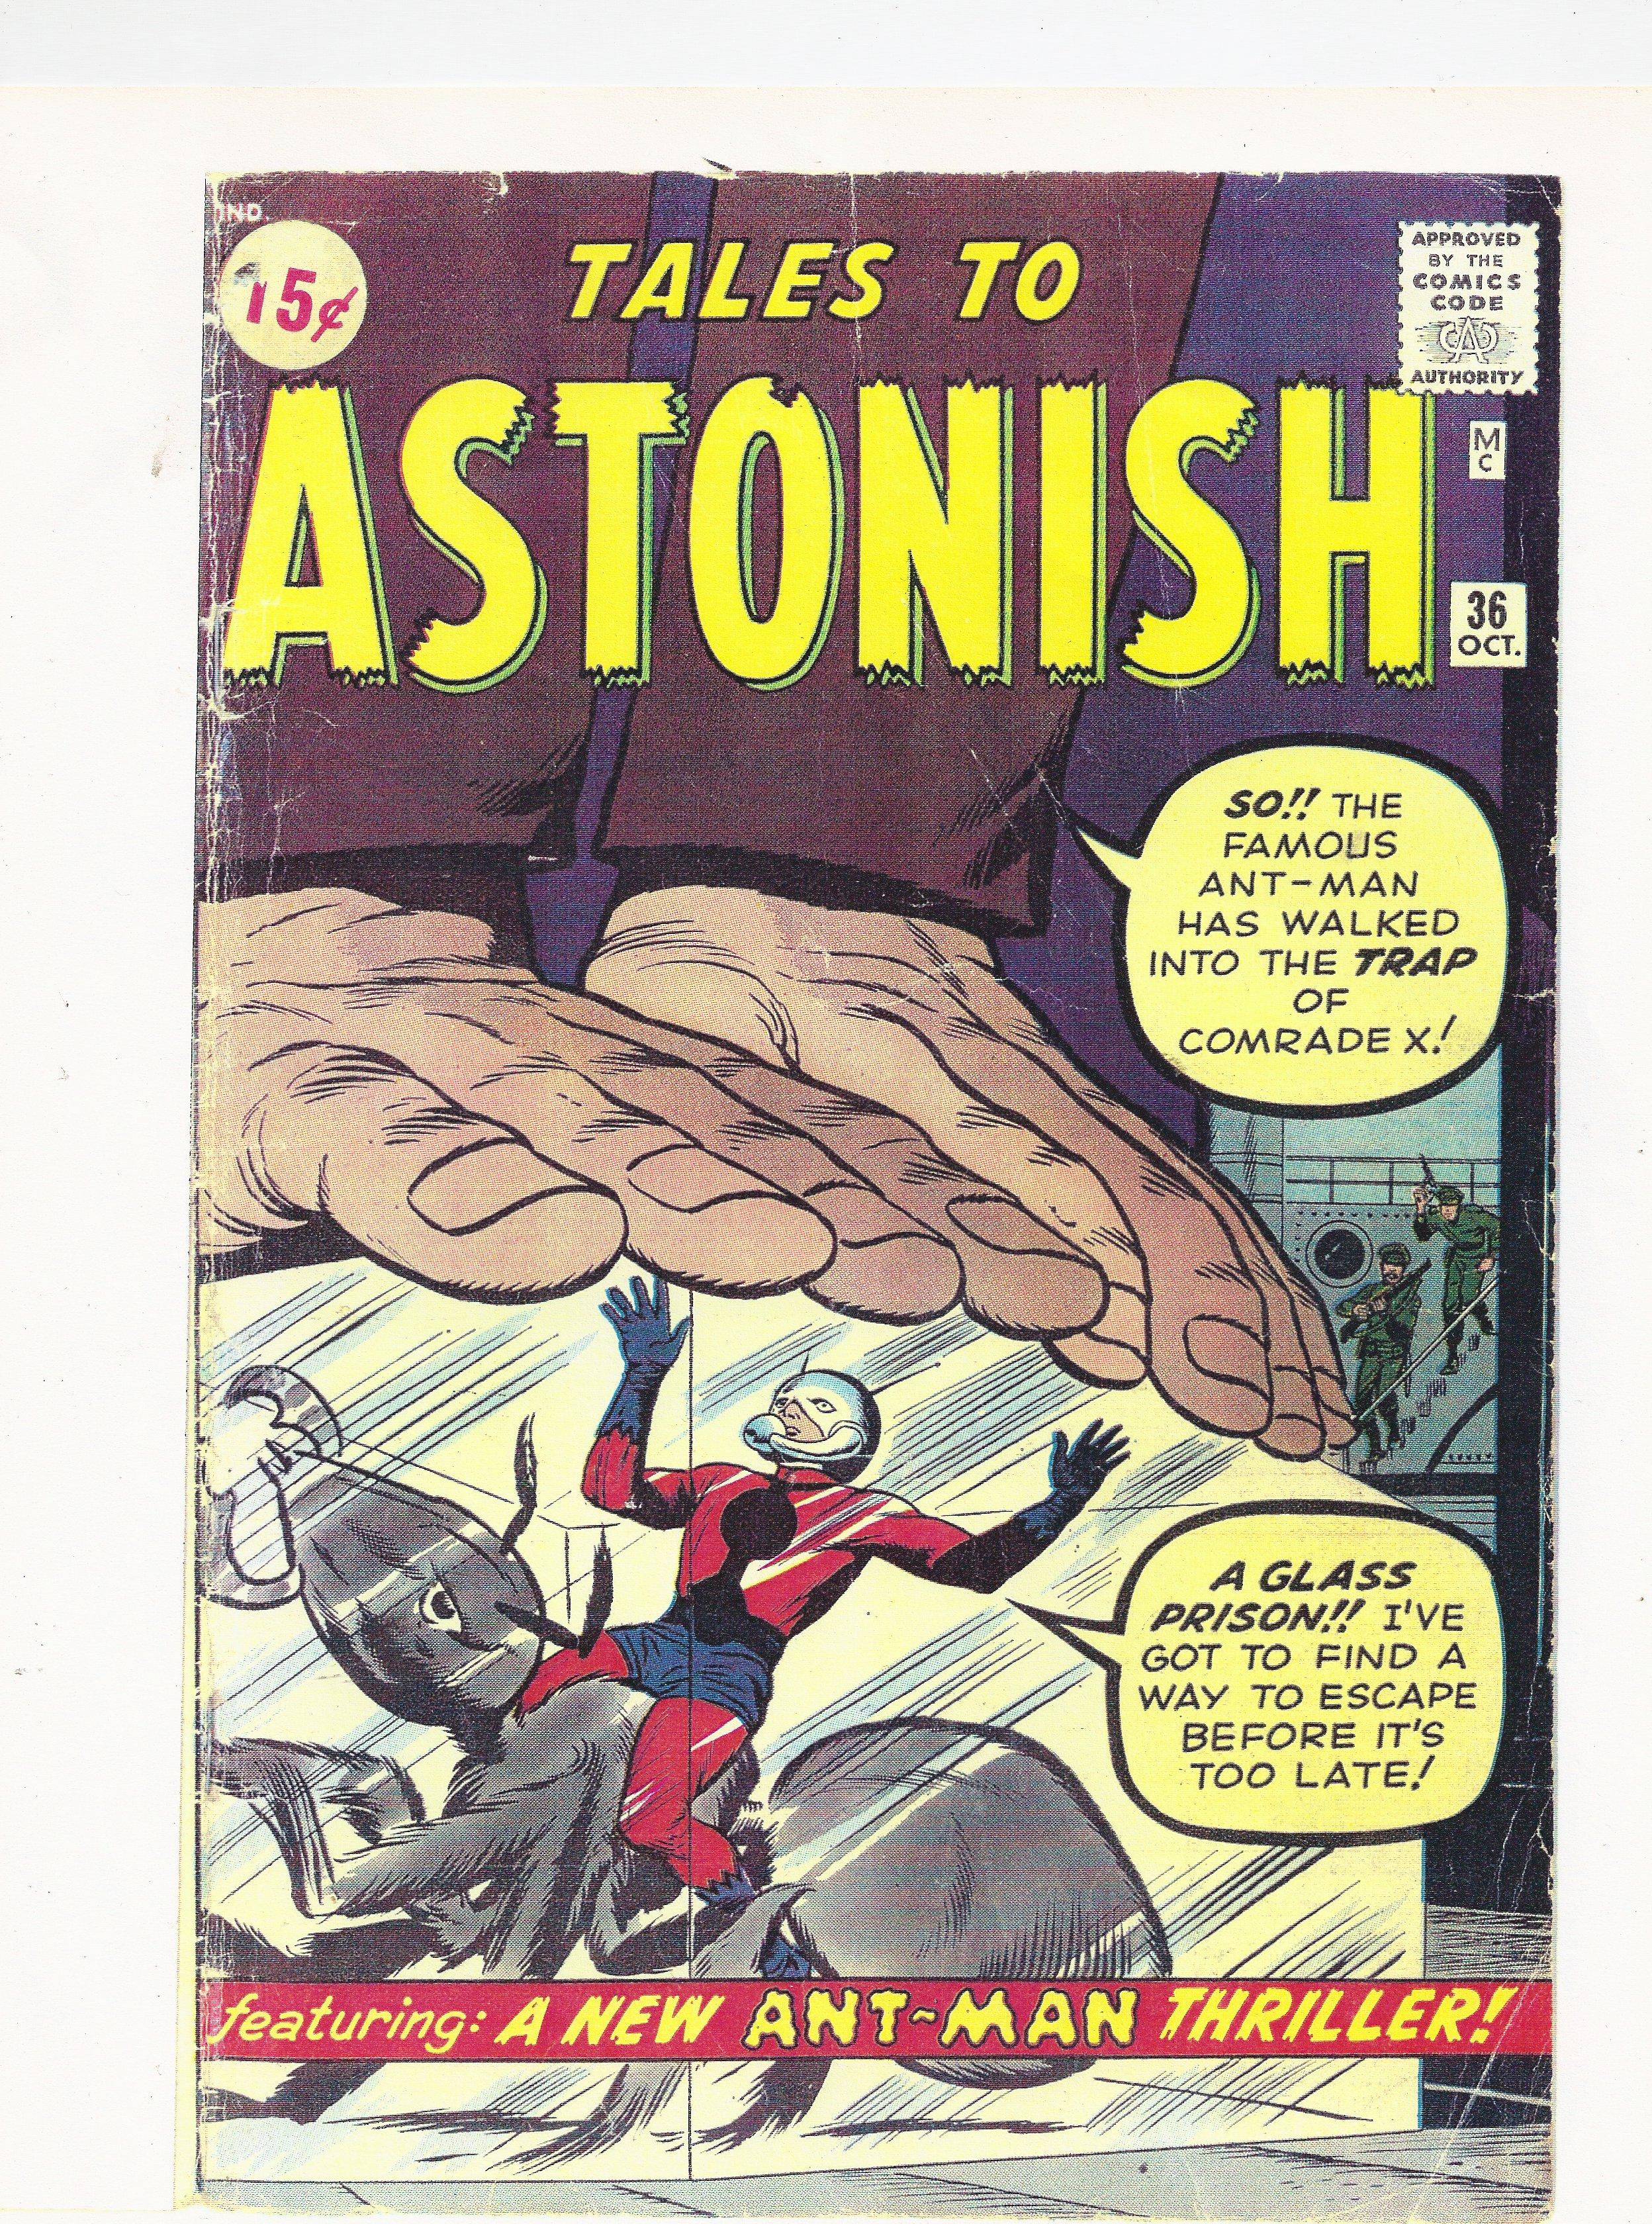 Tales to Astonish 36